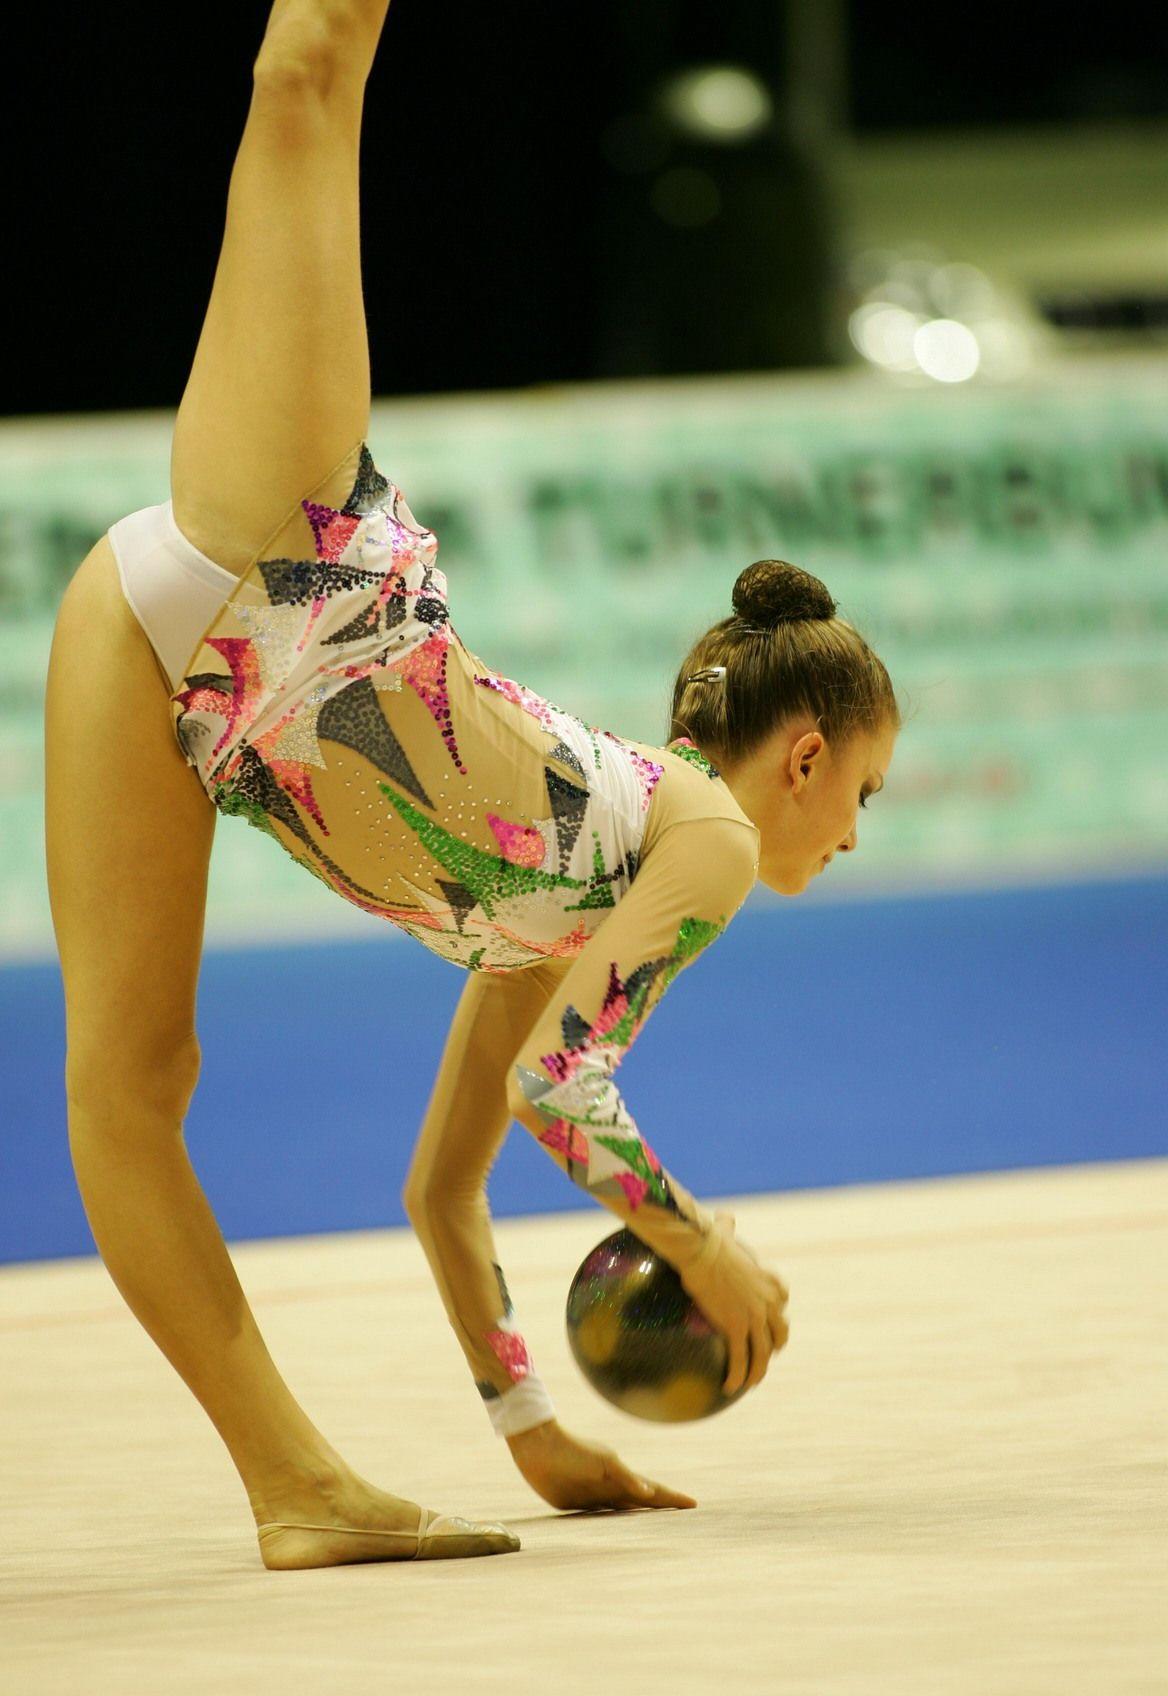 Трусики гимнастки онлайн 3 фотография